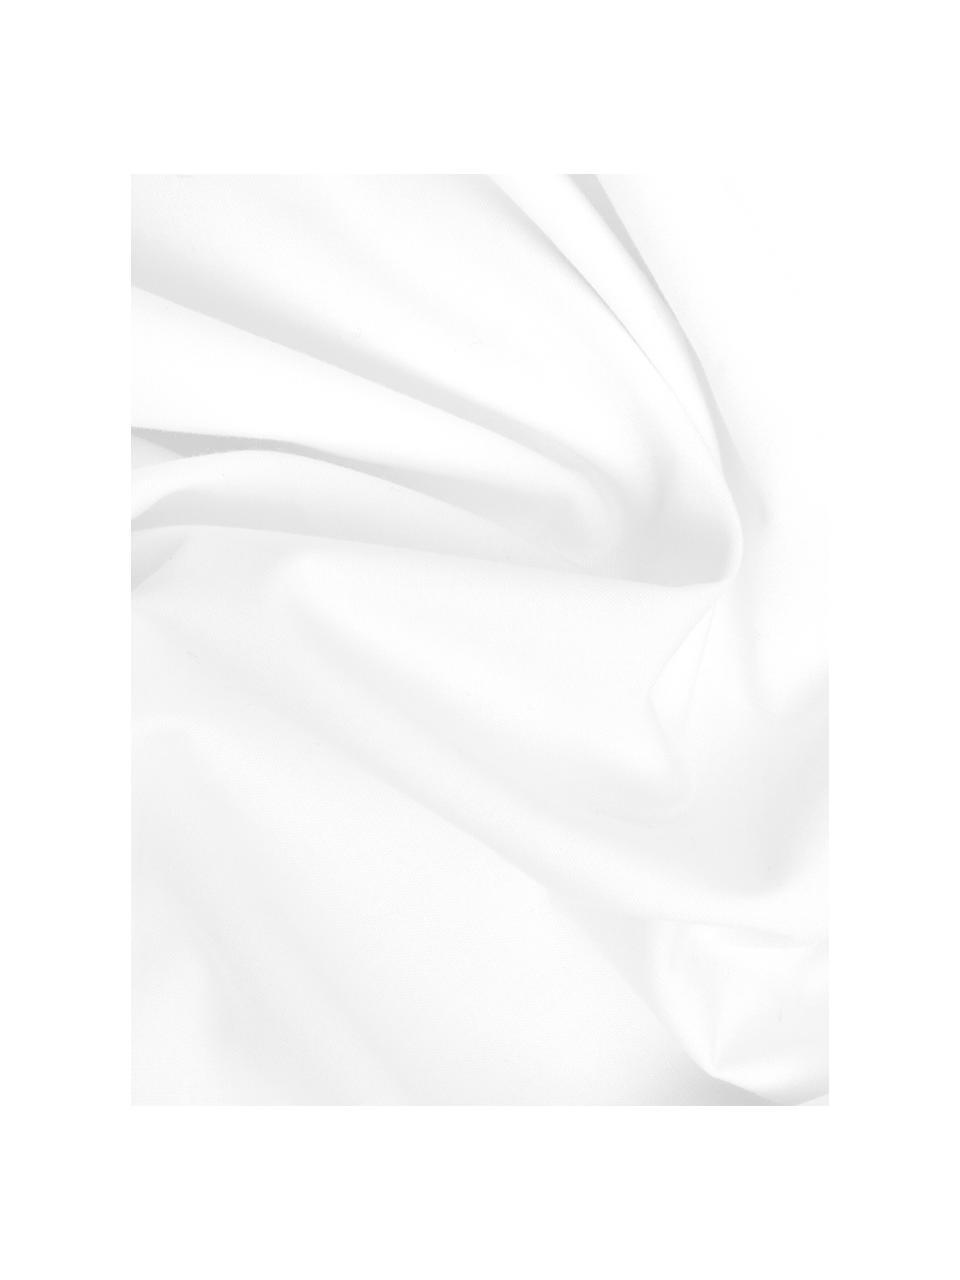 Set lenzuola in percalle bianco Elsie, Bianco, 240 x 300 cm + 2 cuscini 50 x 80 cm